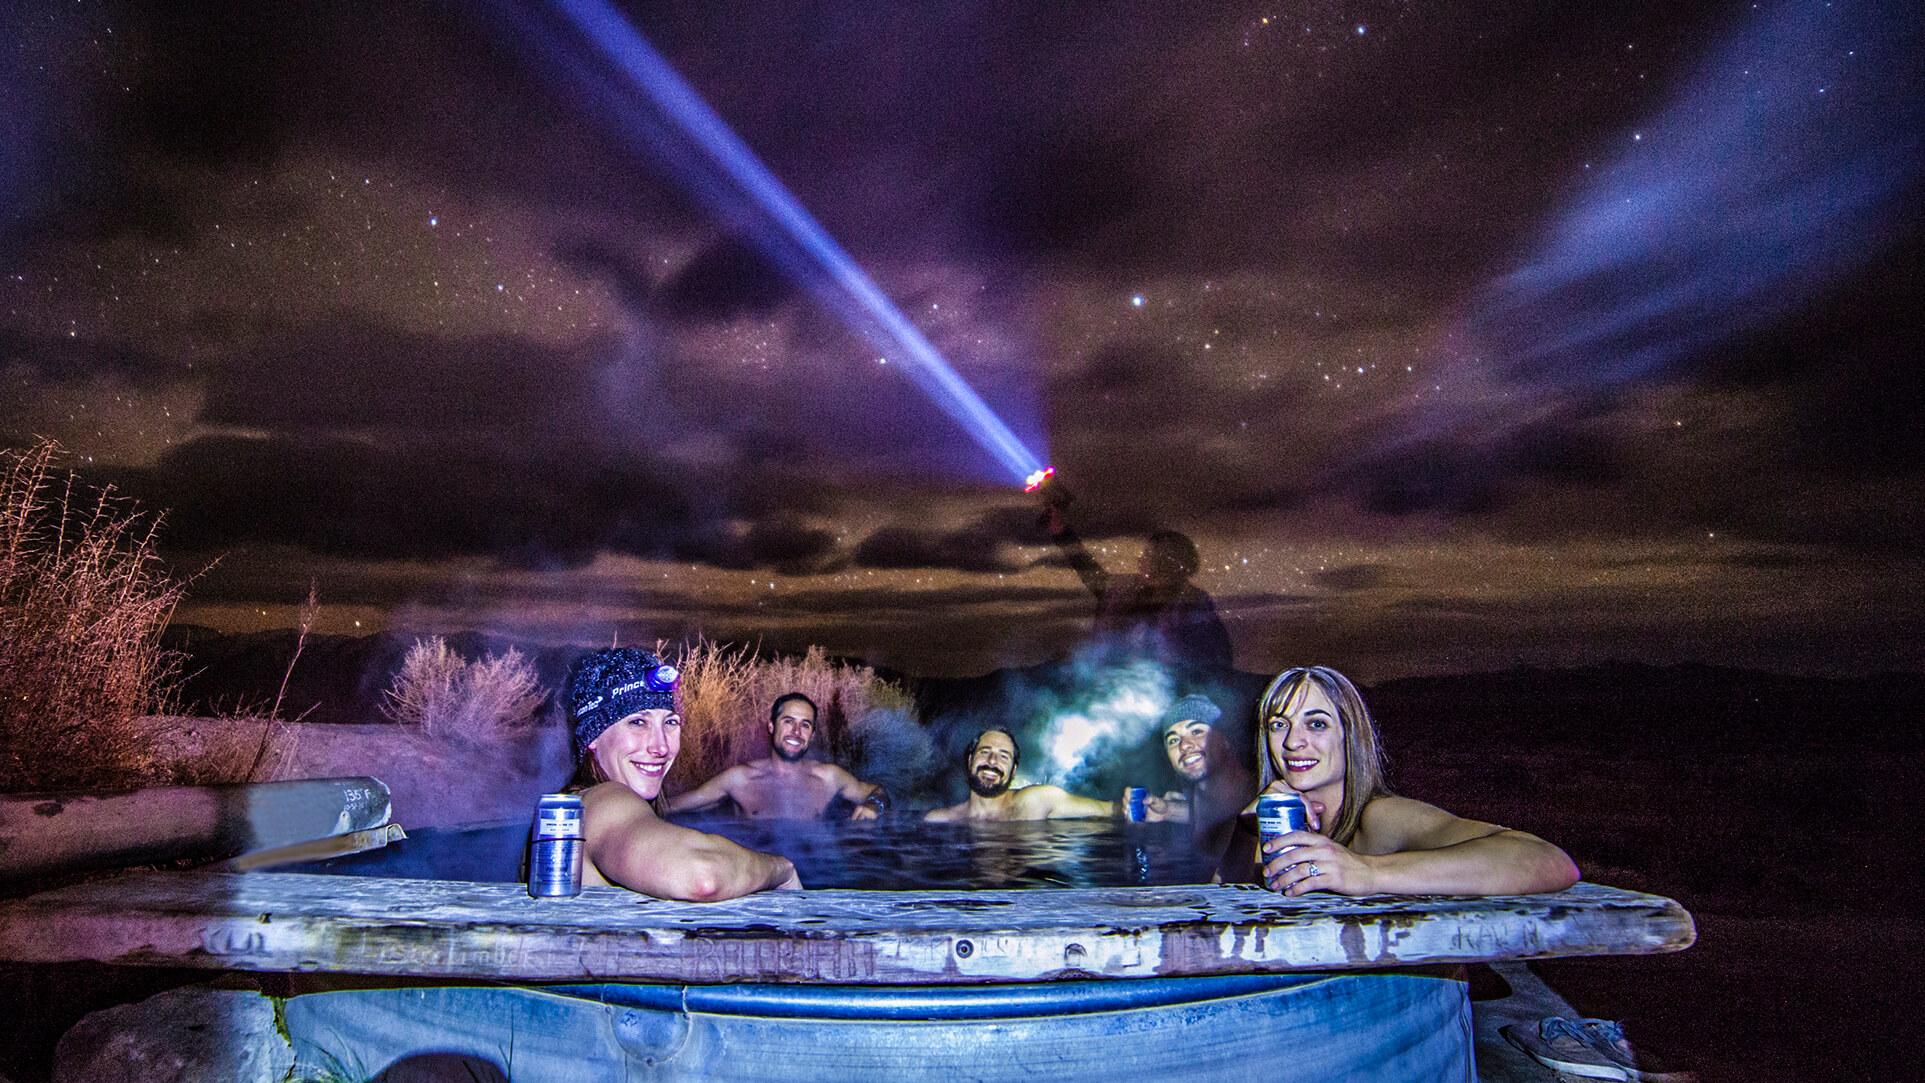 Austin Hot Springs